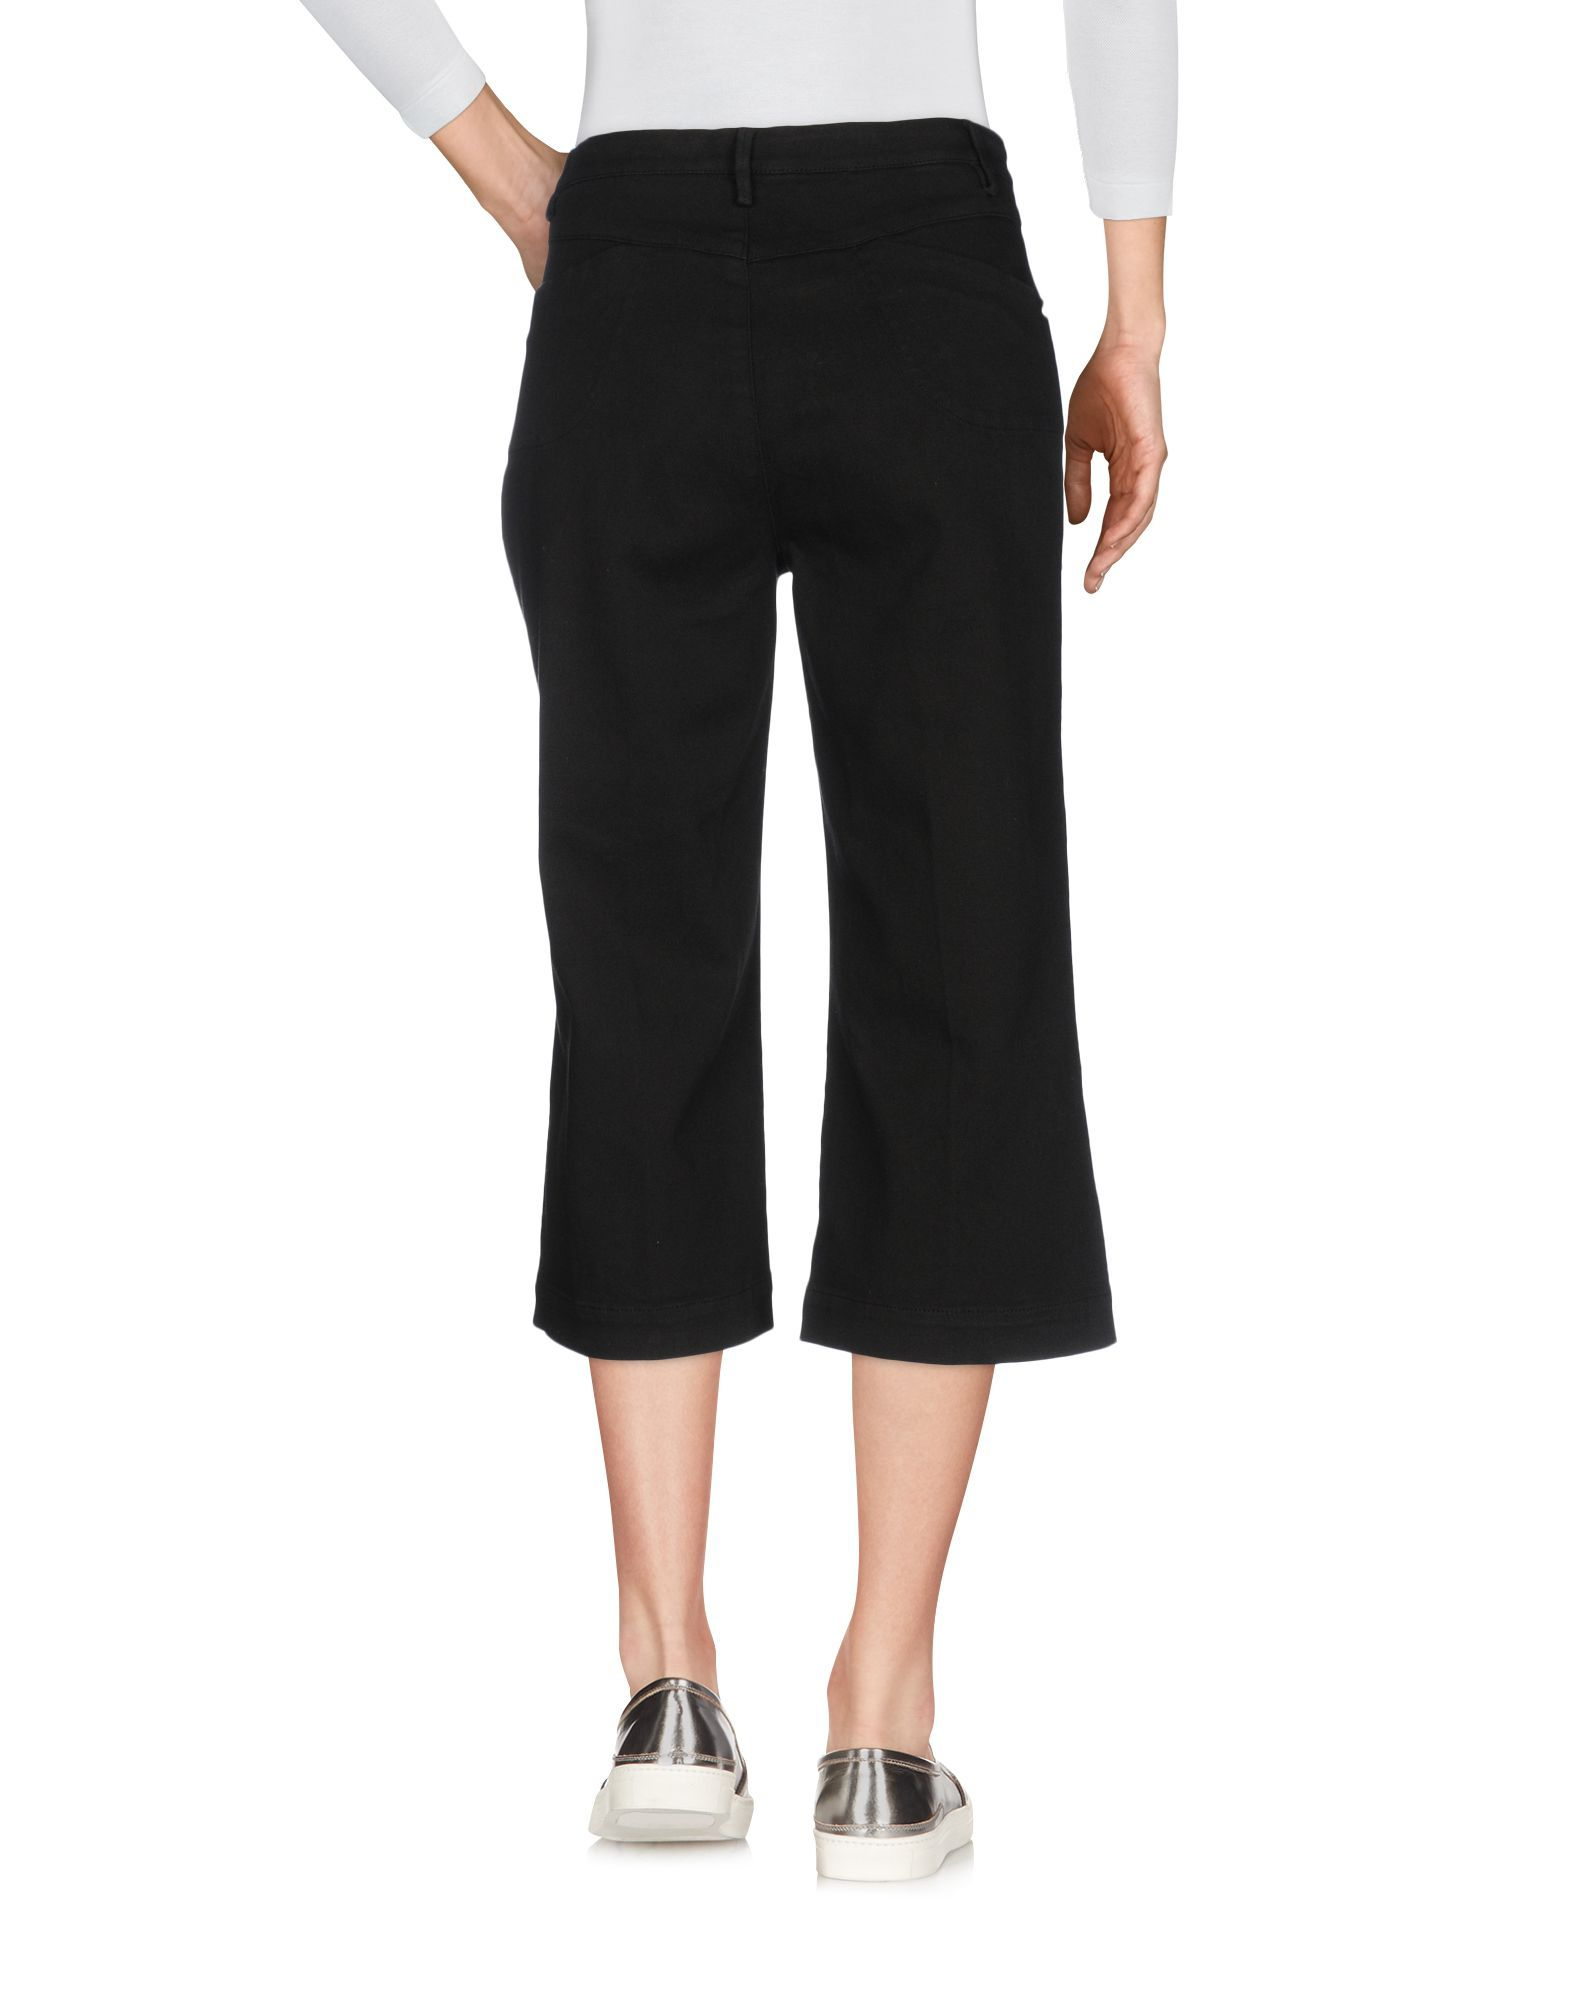 Manila Grace Black Cotton Cropped Trousers